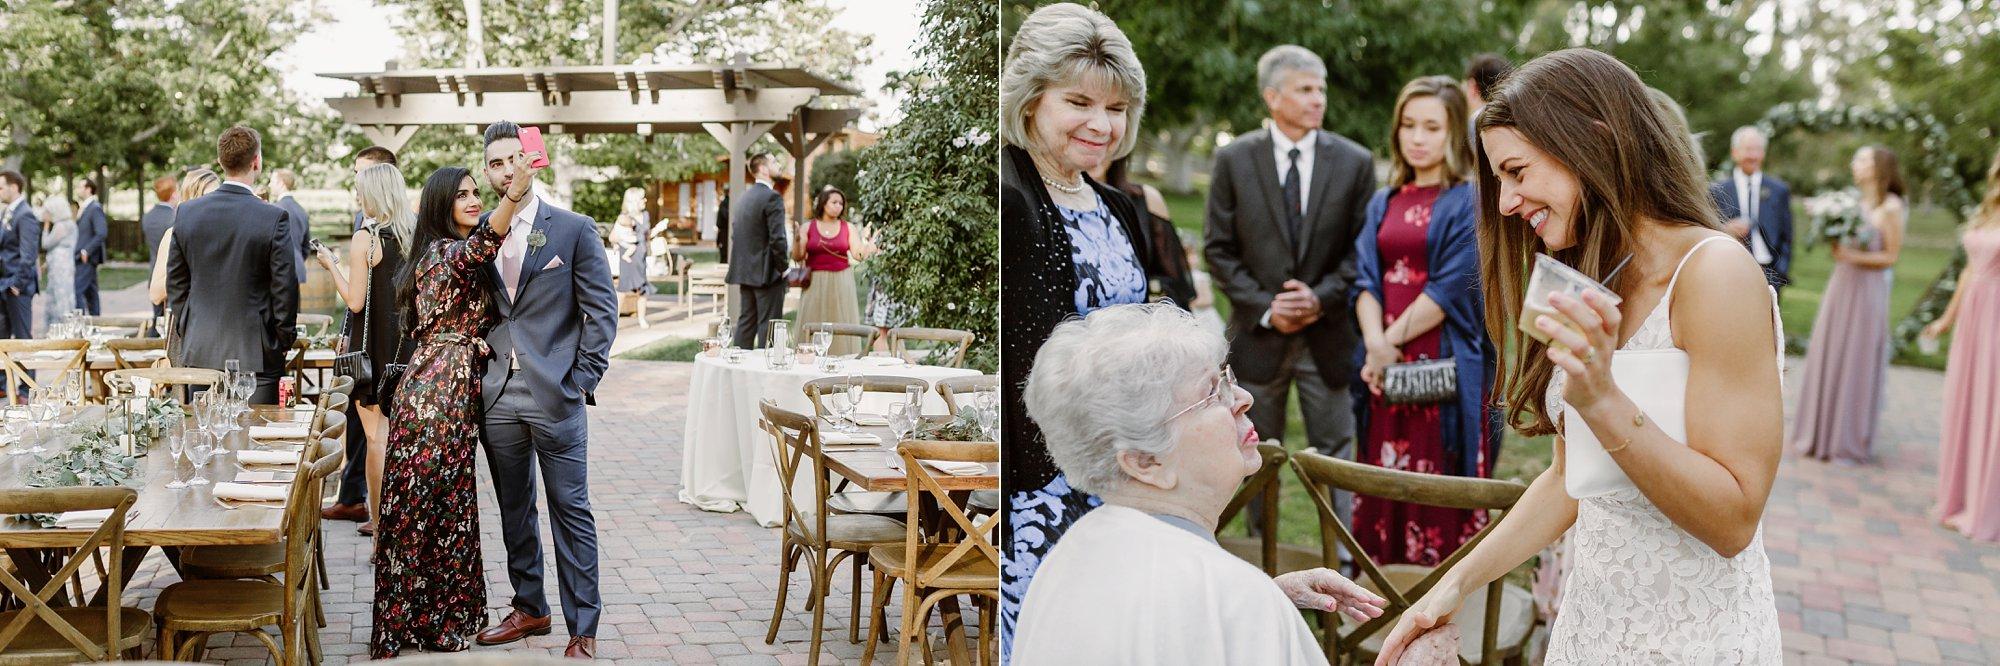 Walnut Grove Moorpark California Wedding_0012.jpg